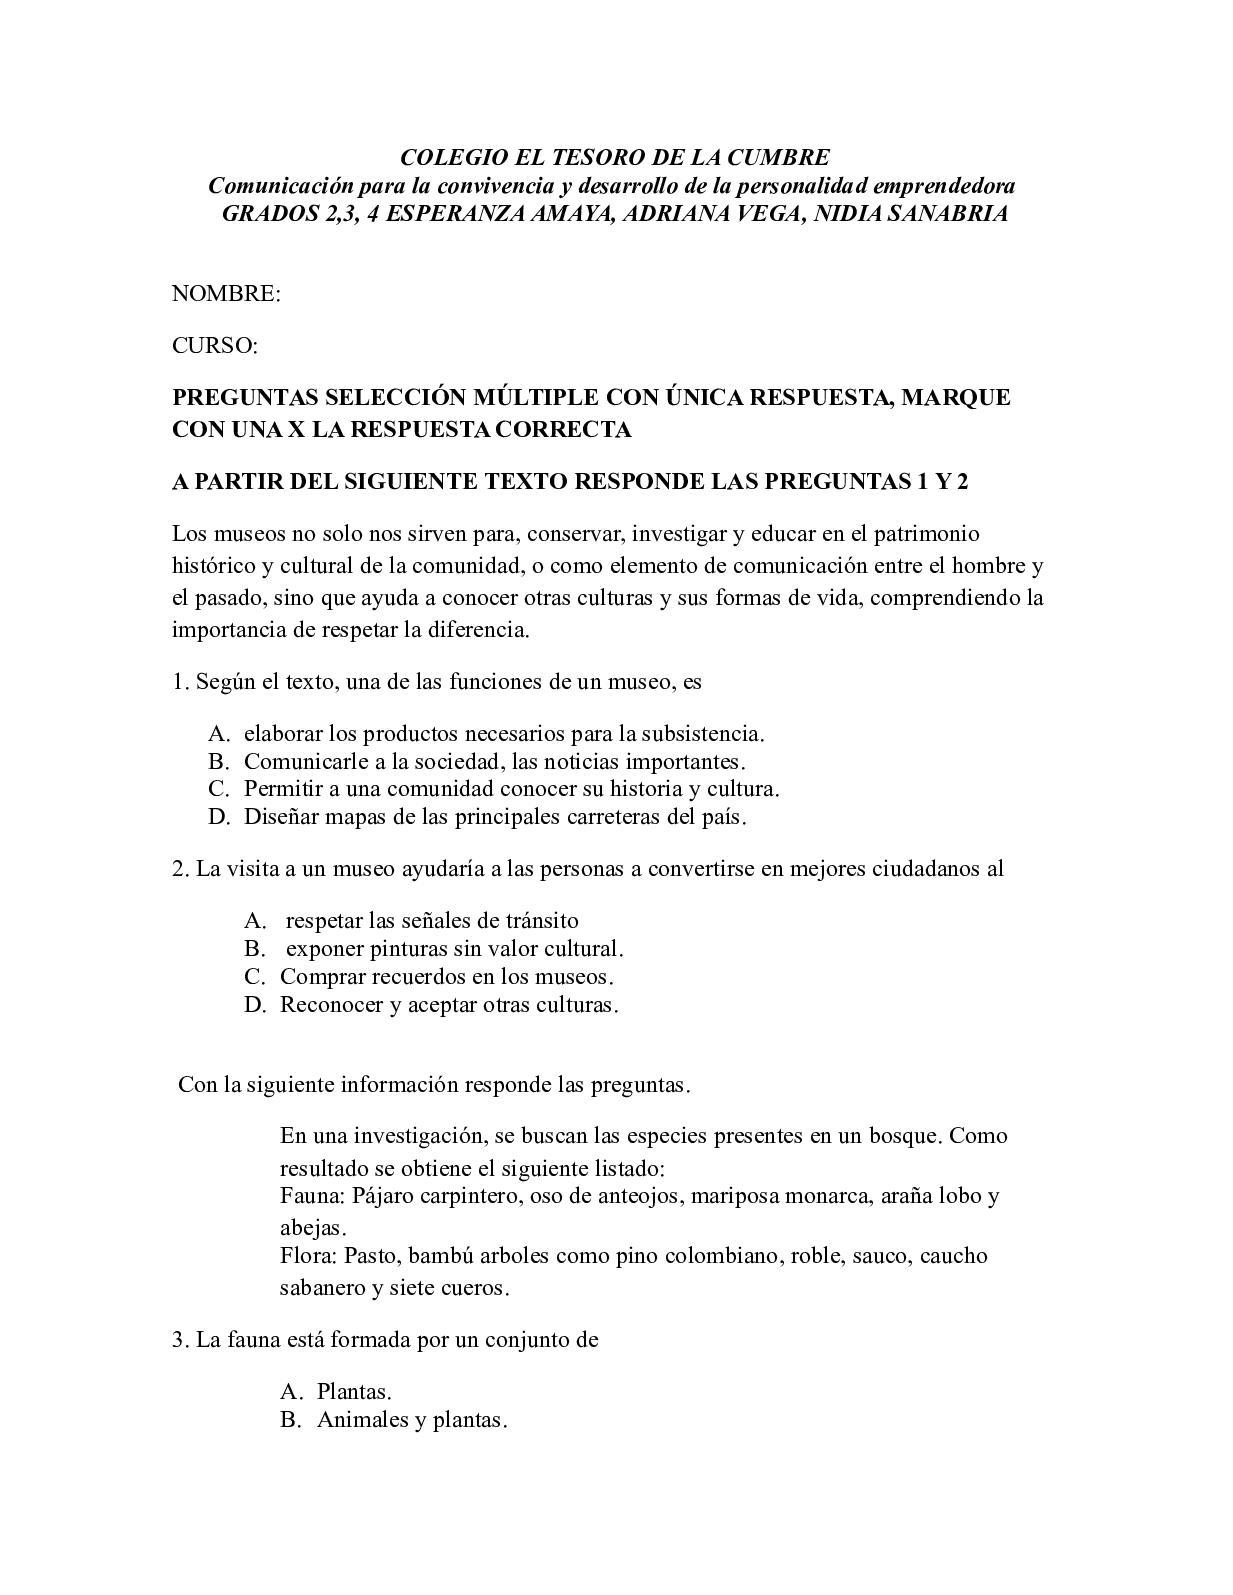 Calameo Pruebas Examen Grado Tercero 2018